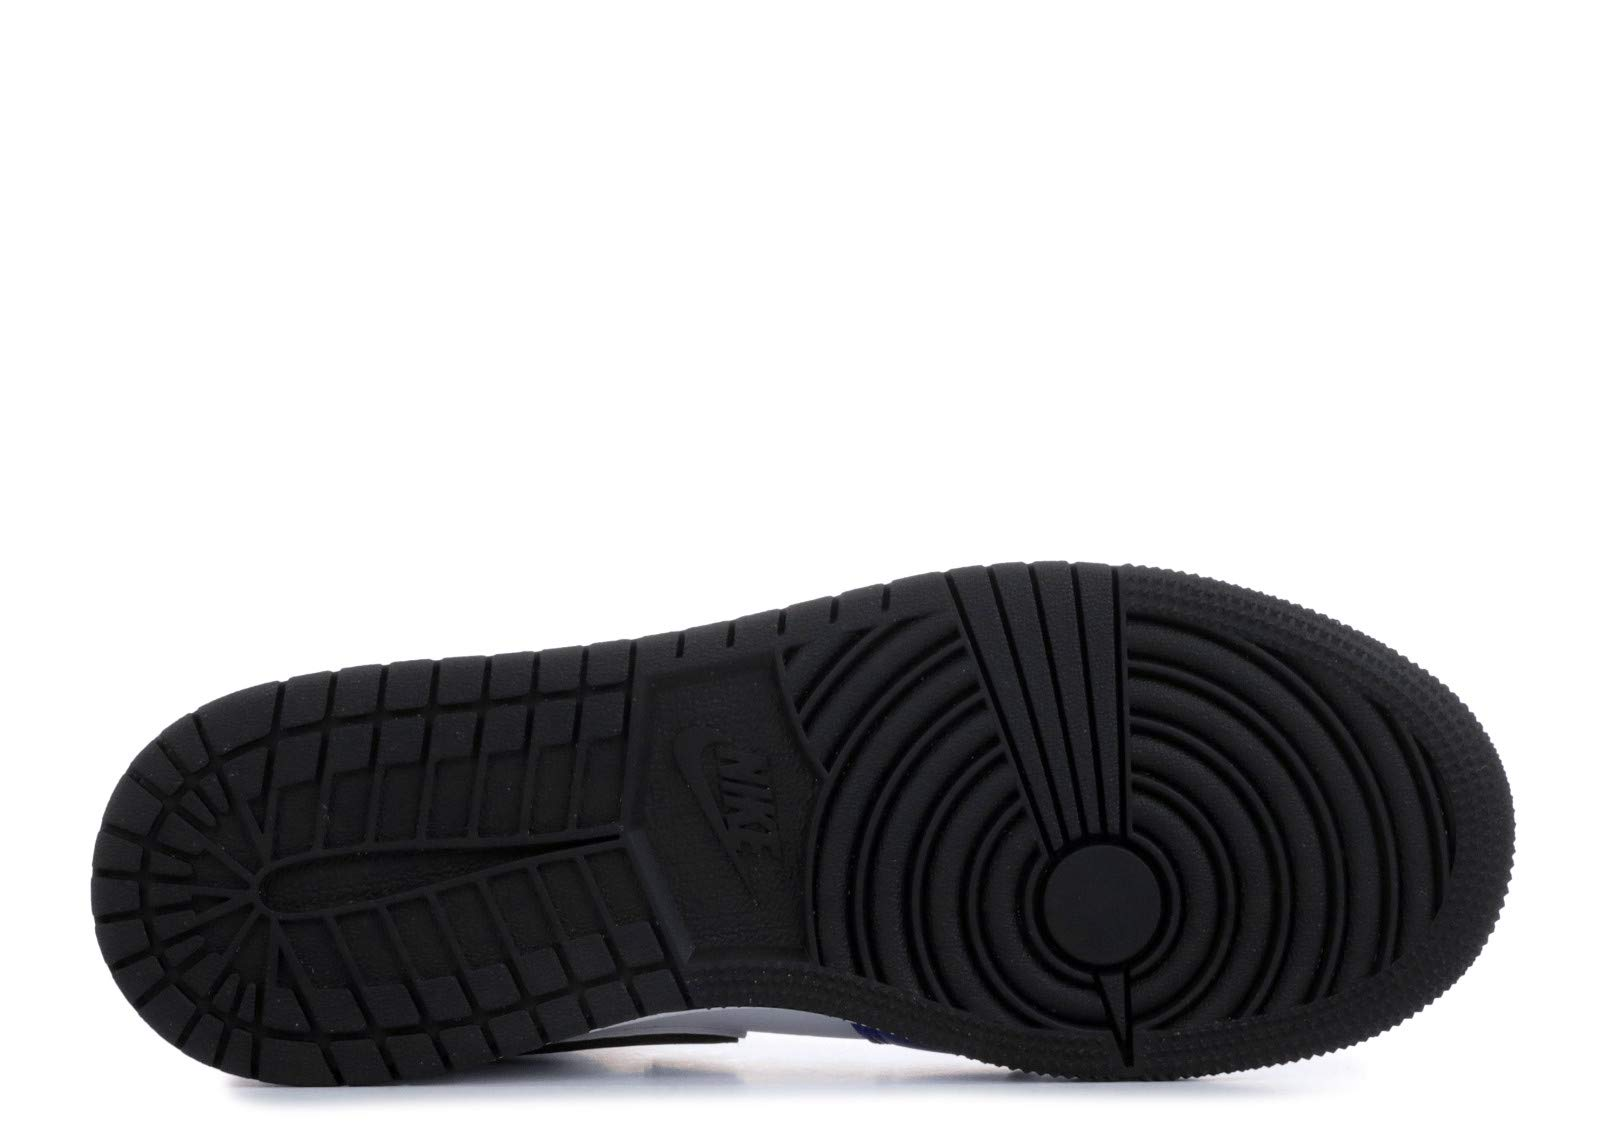 Nike Boys' Air Jordan 1 Mid (GS) Shoe Scarpe da Basket